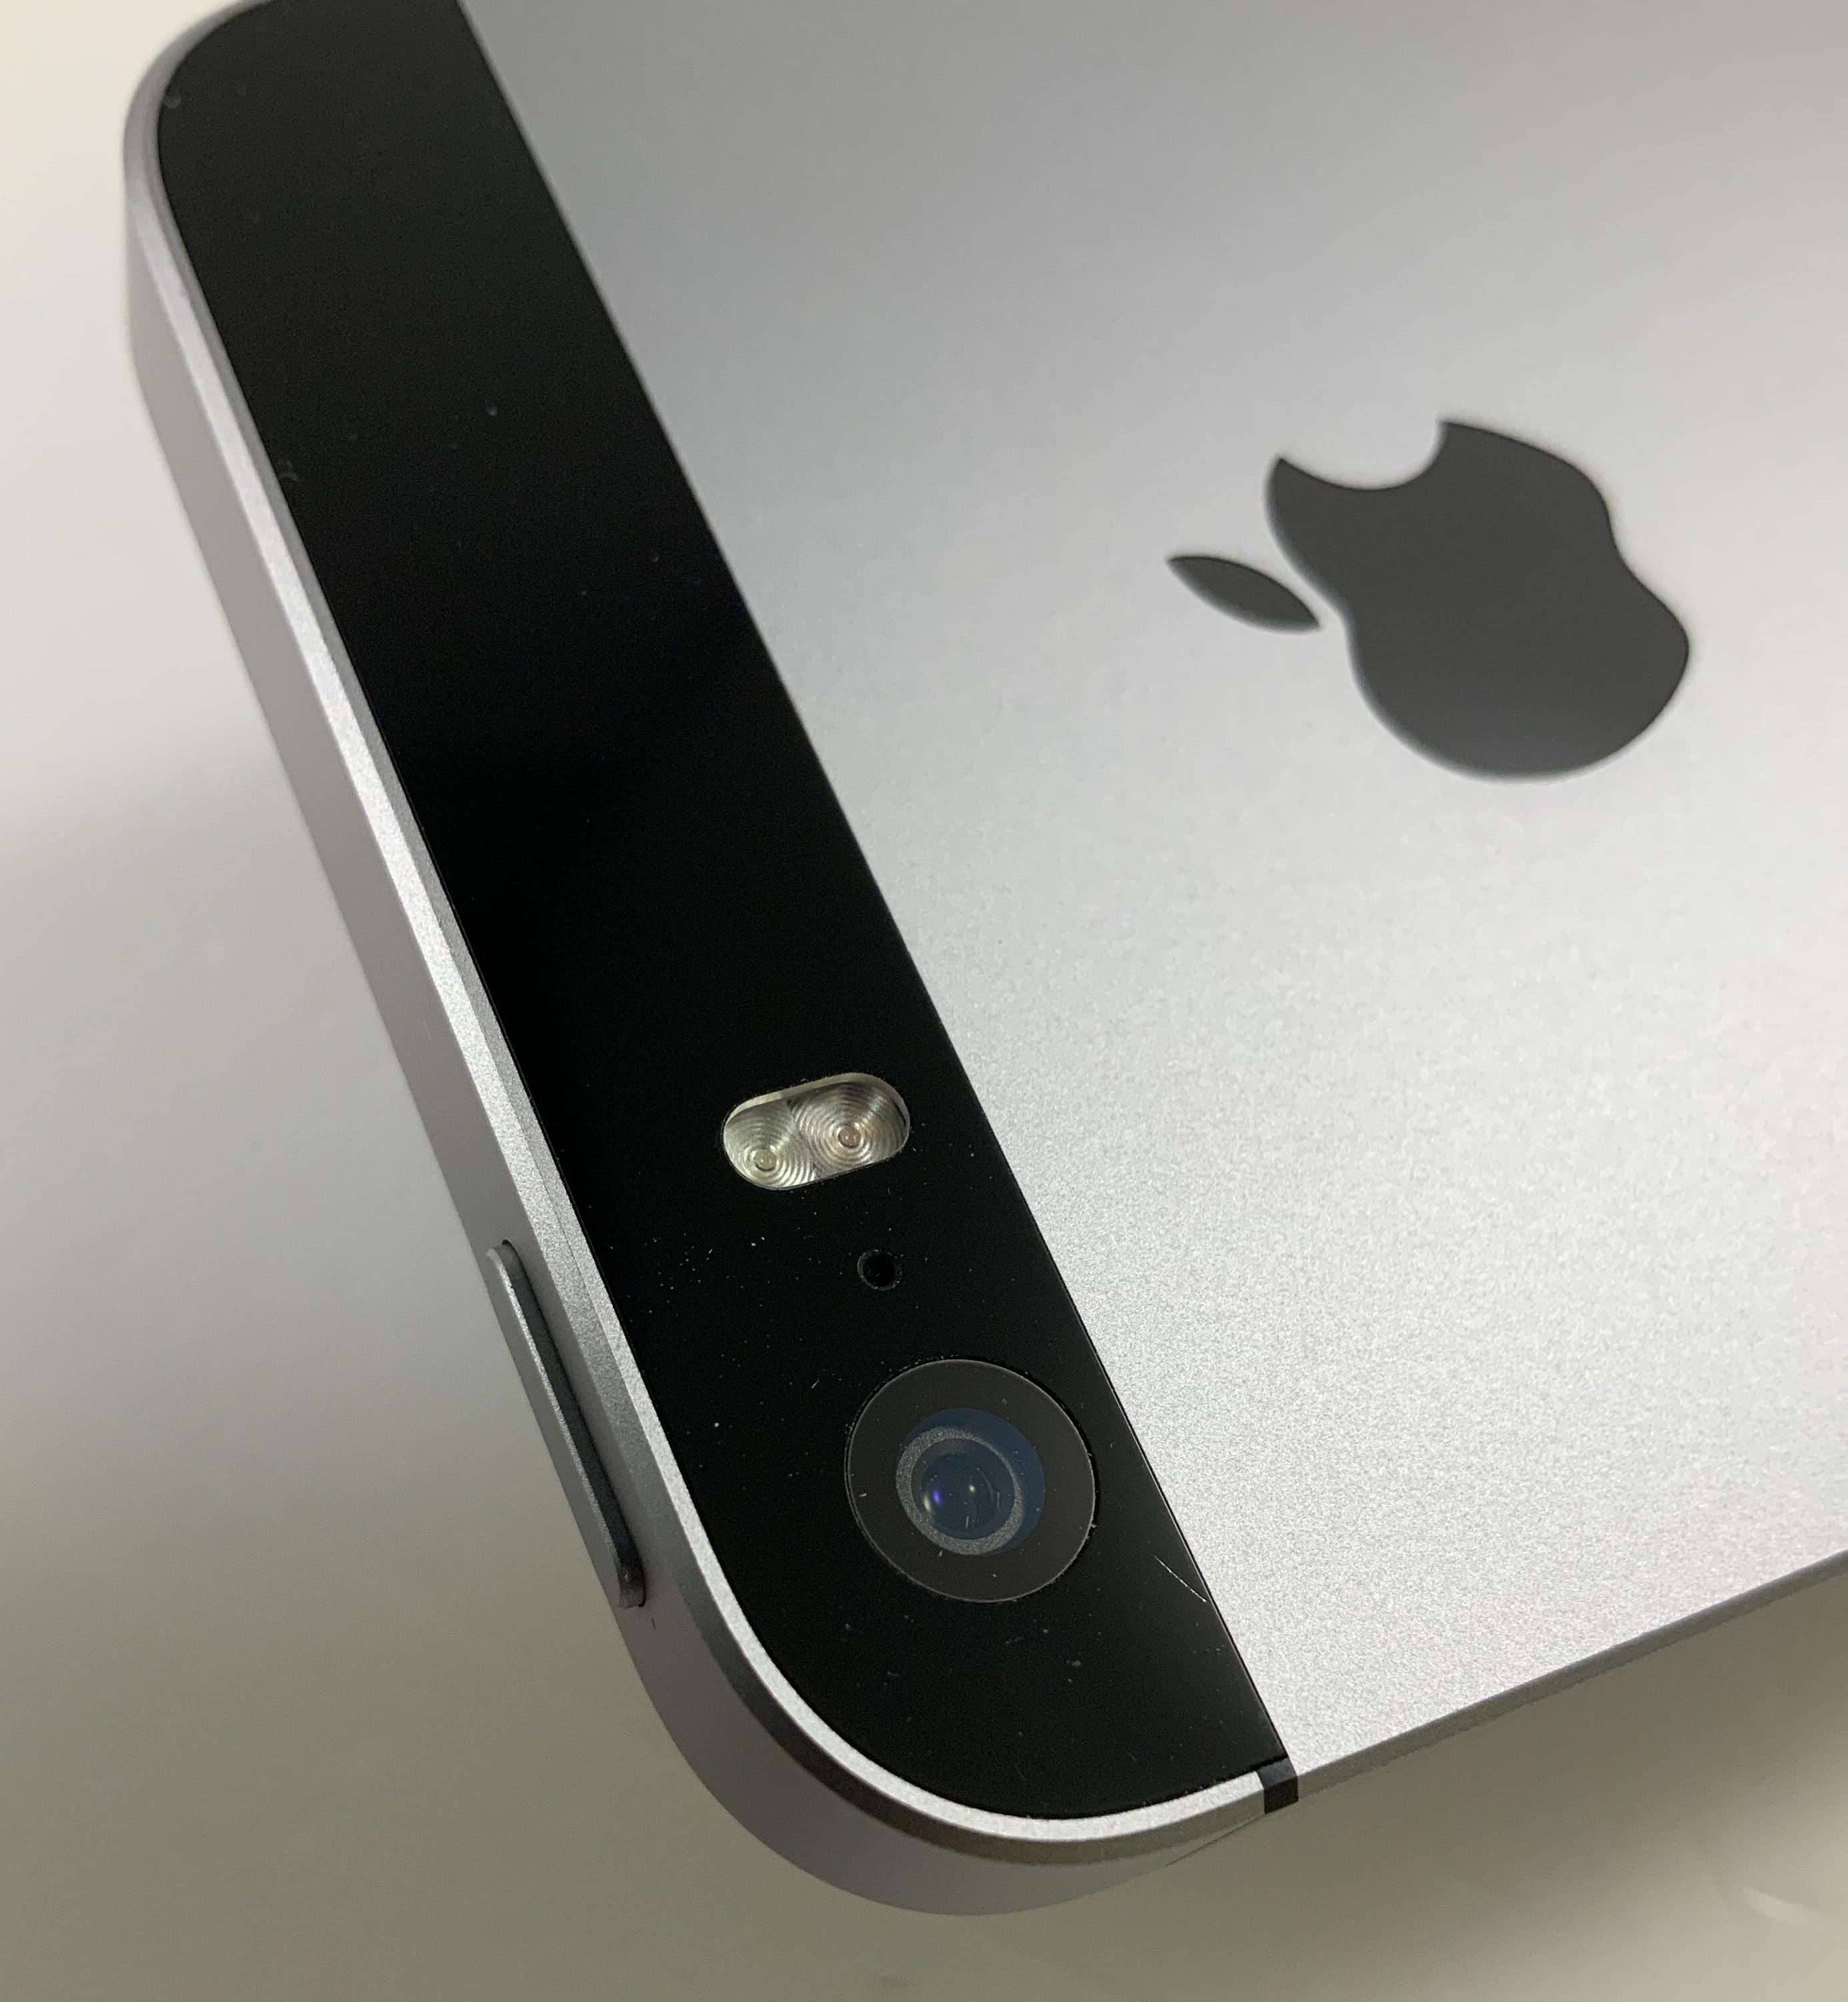 iPhone SE 32GB, 32GB, Space Gray, Kuva 4